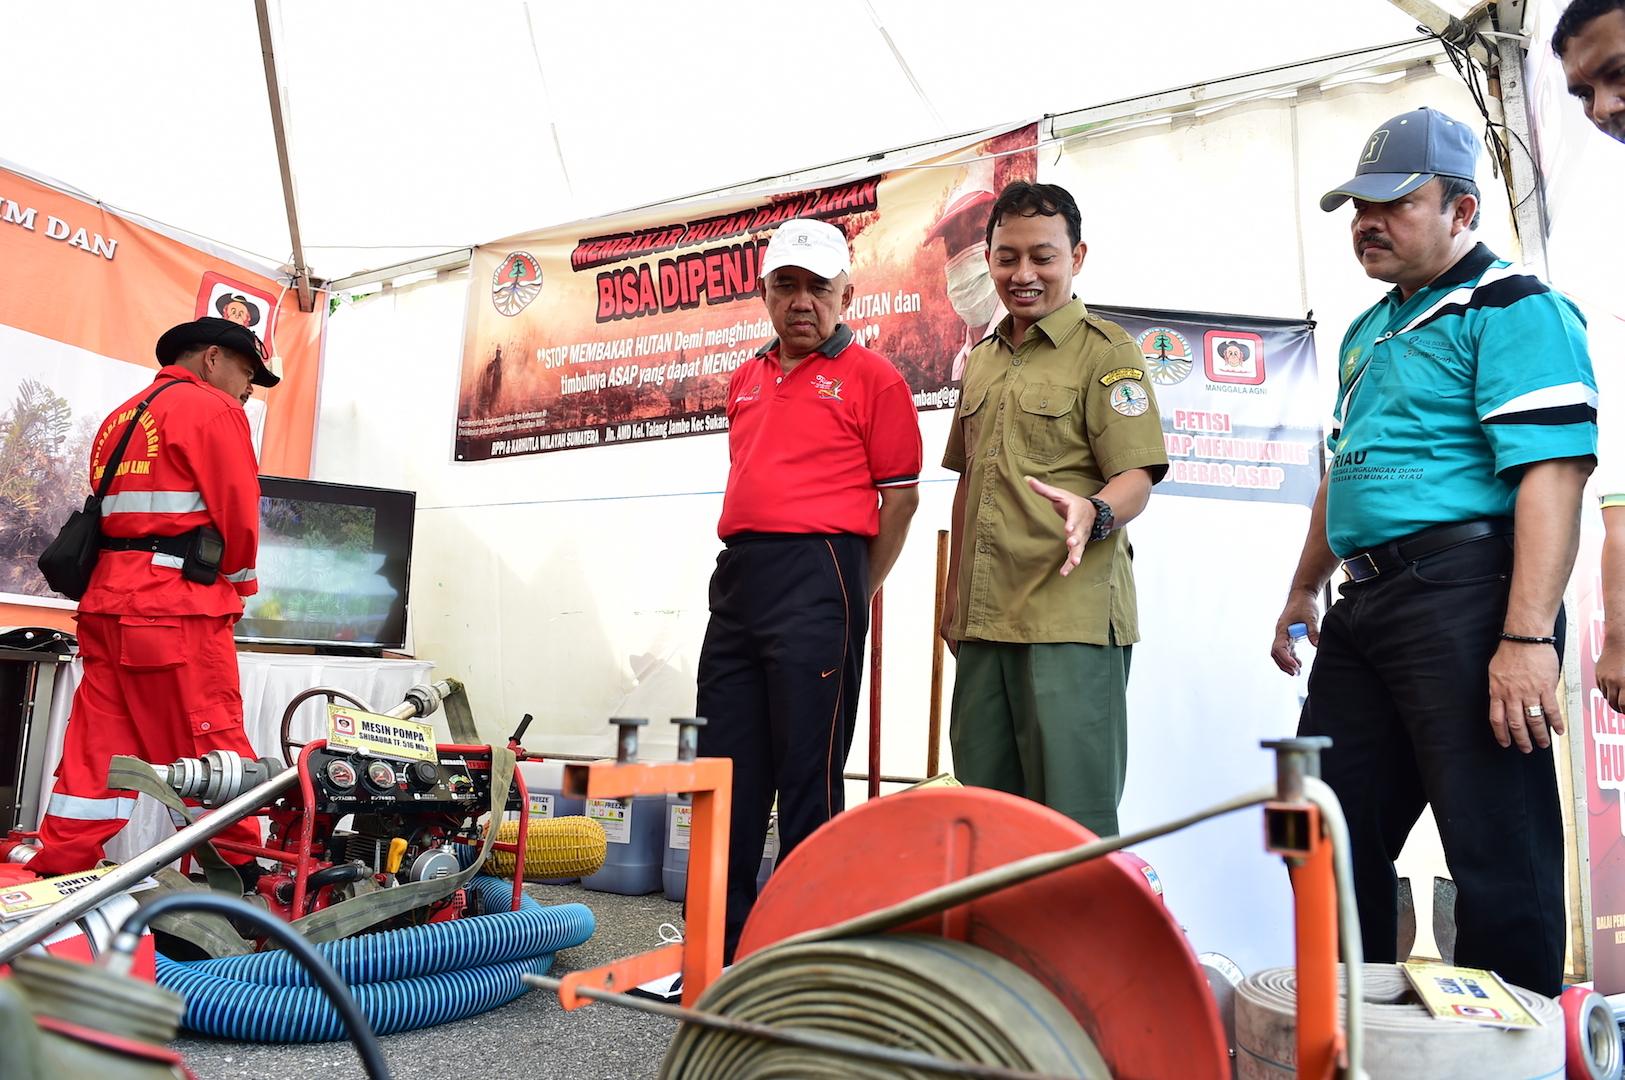 Gubri saat meninjau stand pameran Manggala Agni pada Riau Pustaka Lingkungan Dunia Yayasan Komunal Riau di Gor Tribuana